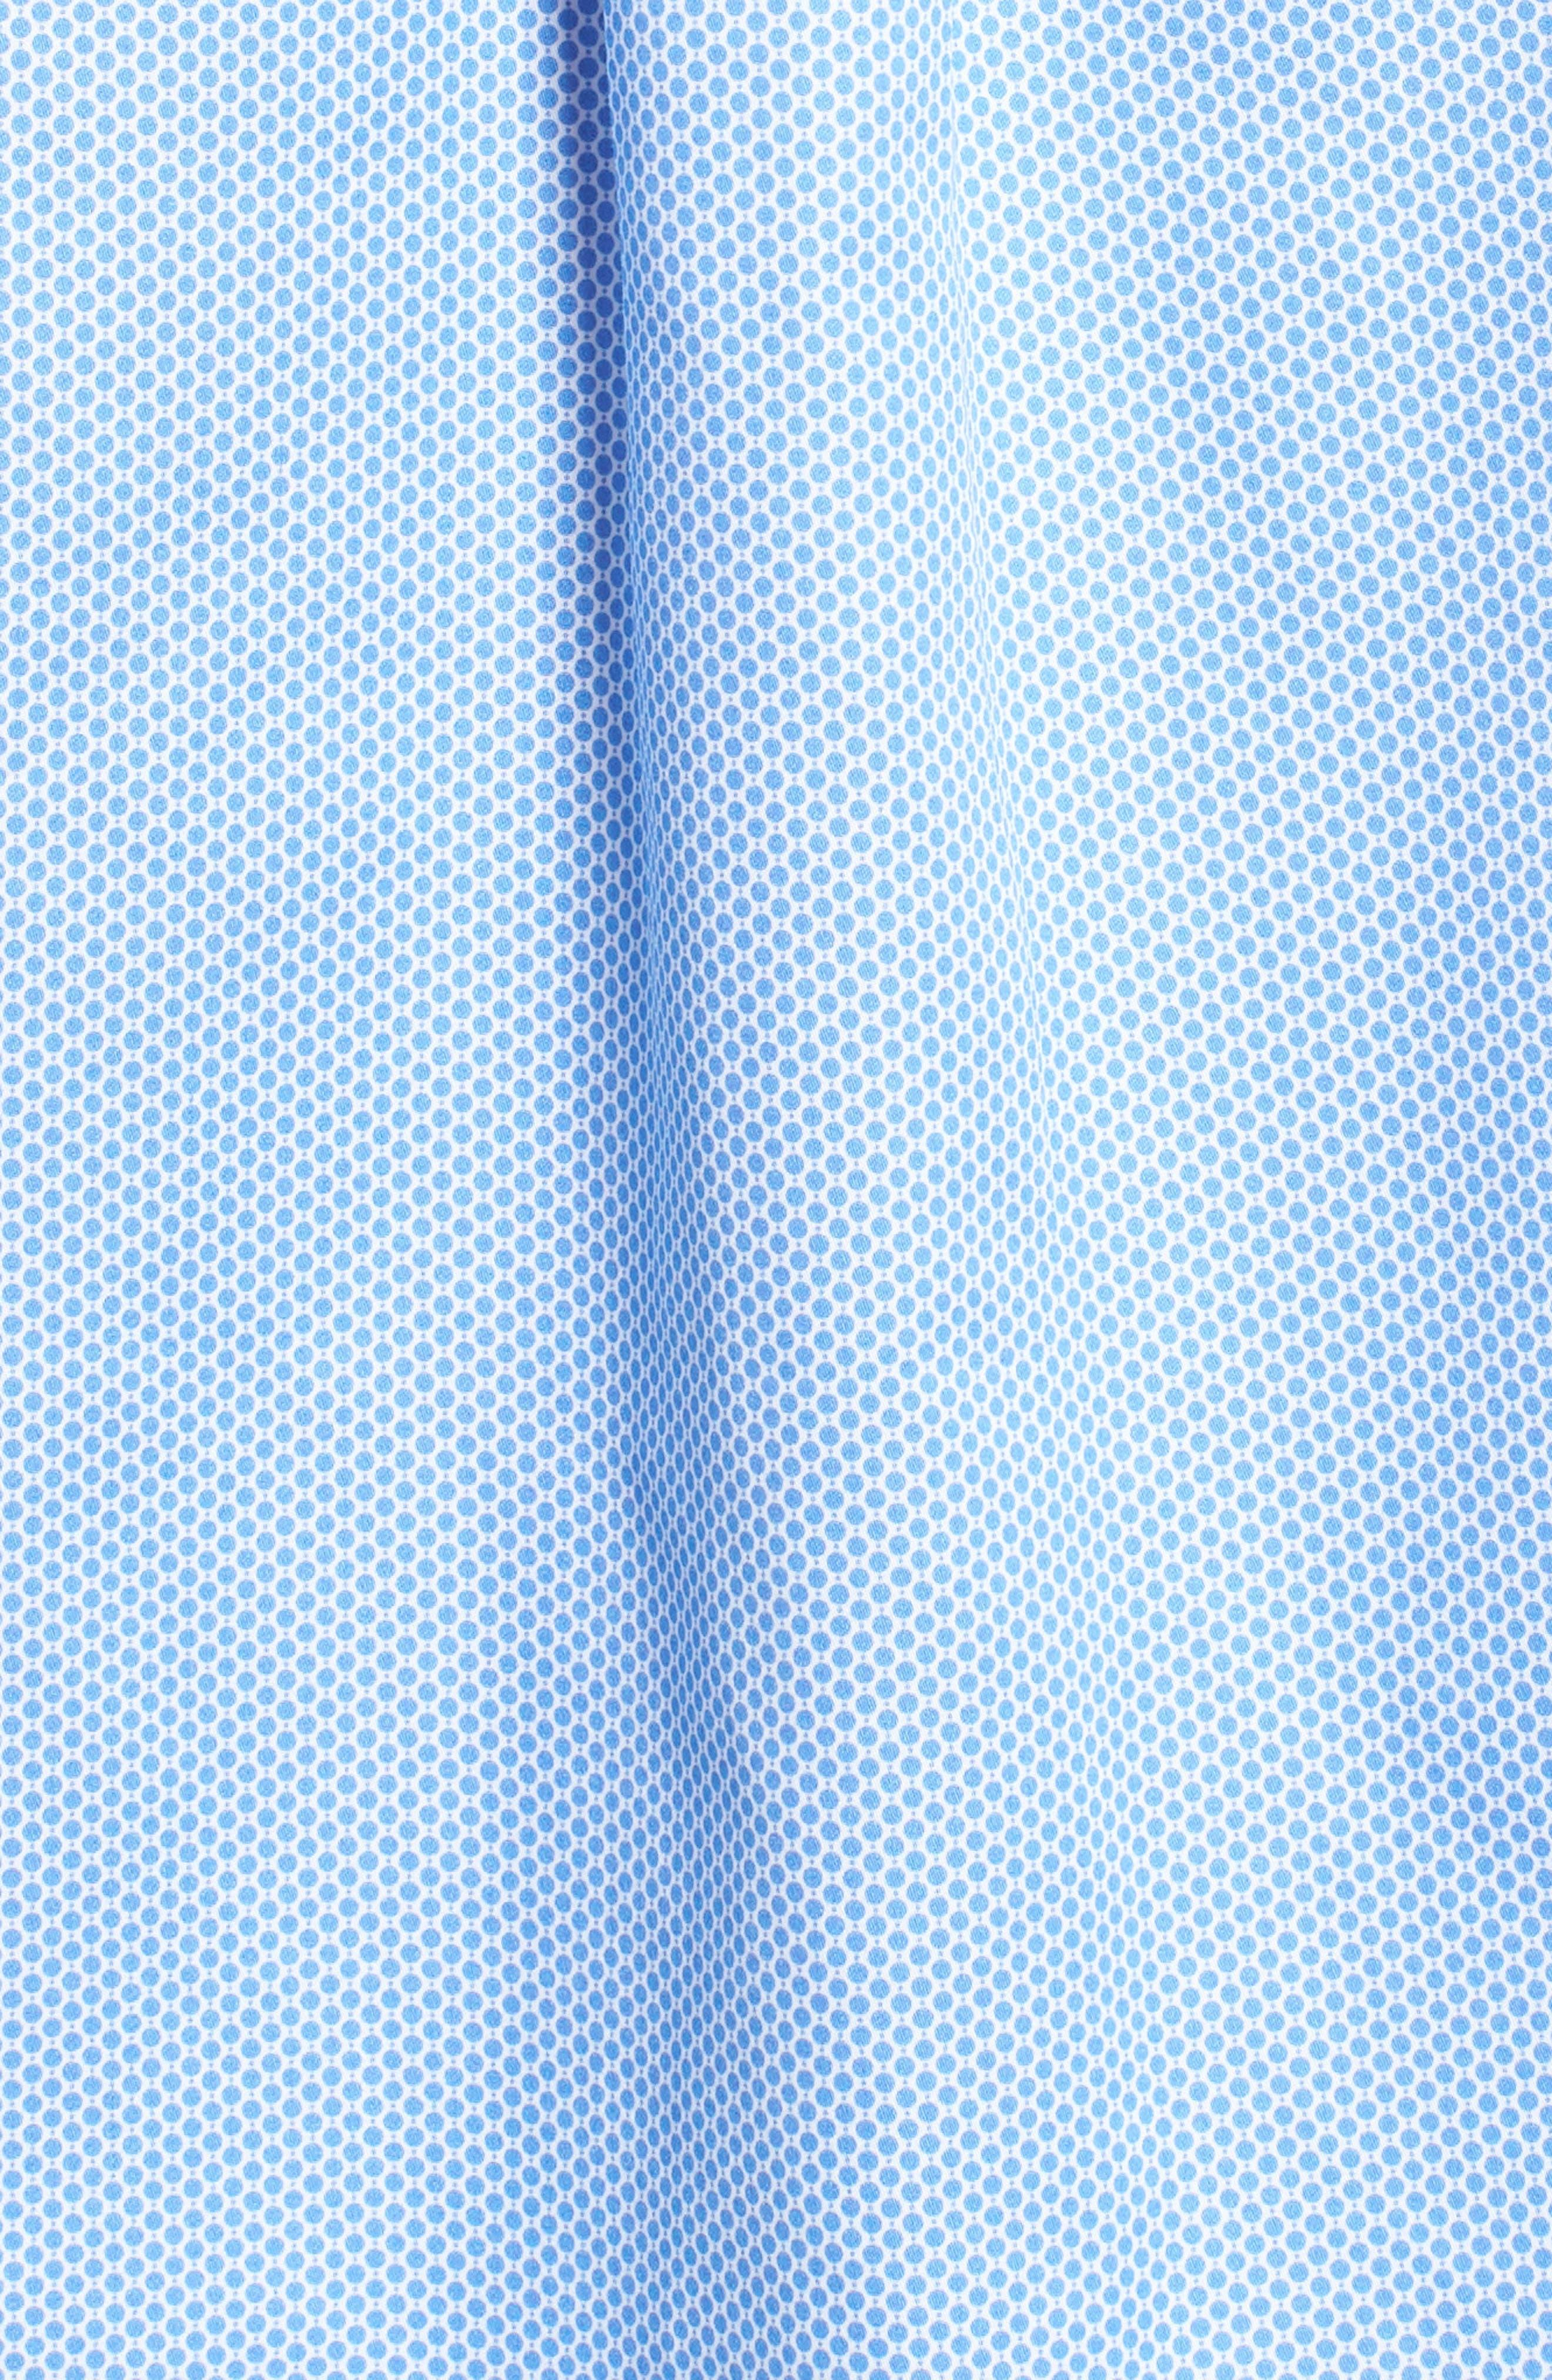 Crown Ease Connecting the Dots Sport Shirt,                             Alternate thumbnail 5, color,                             Atlas Blue